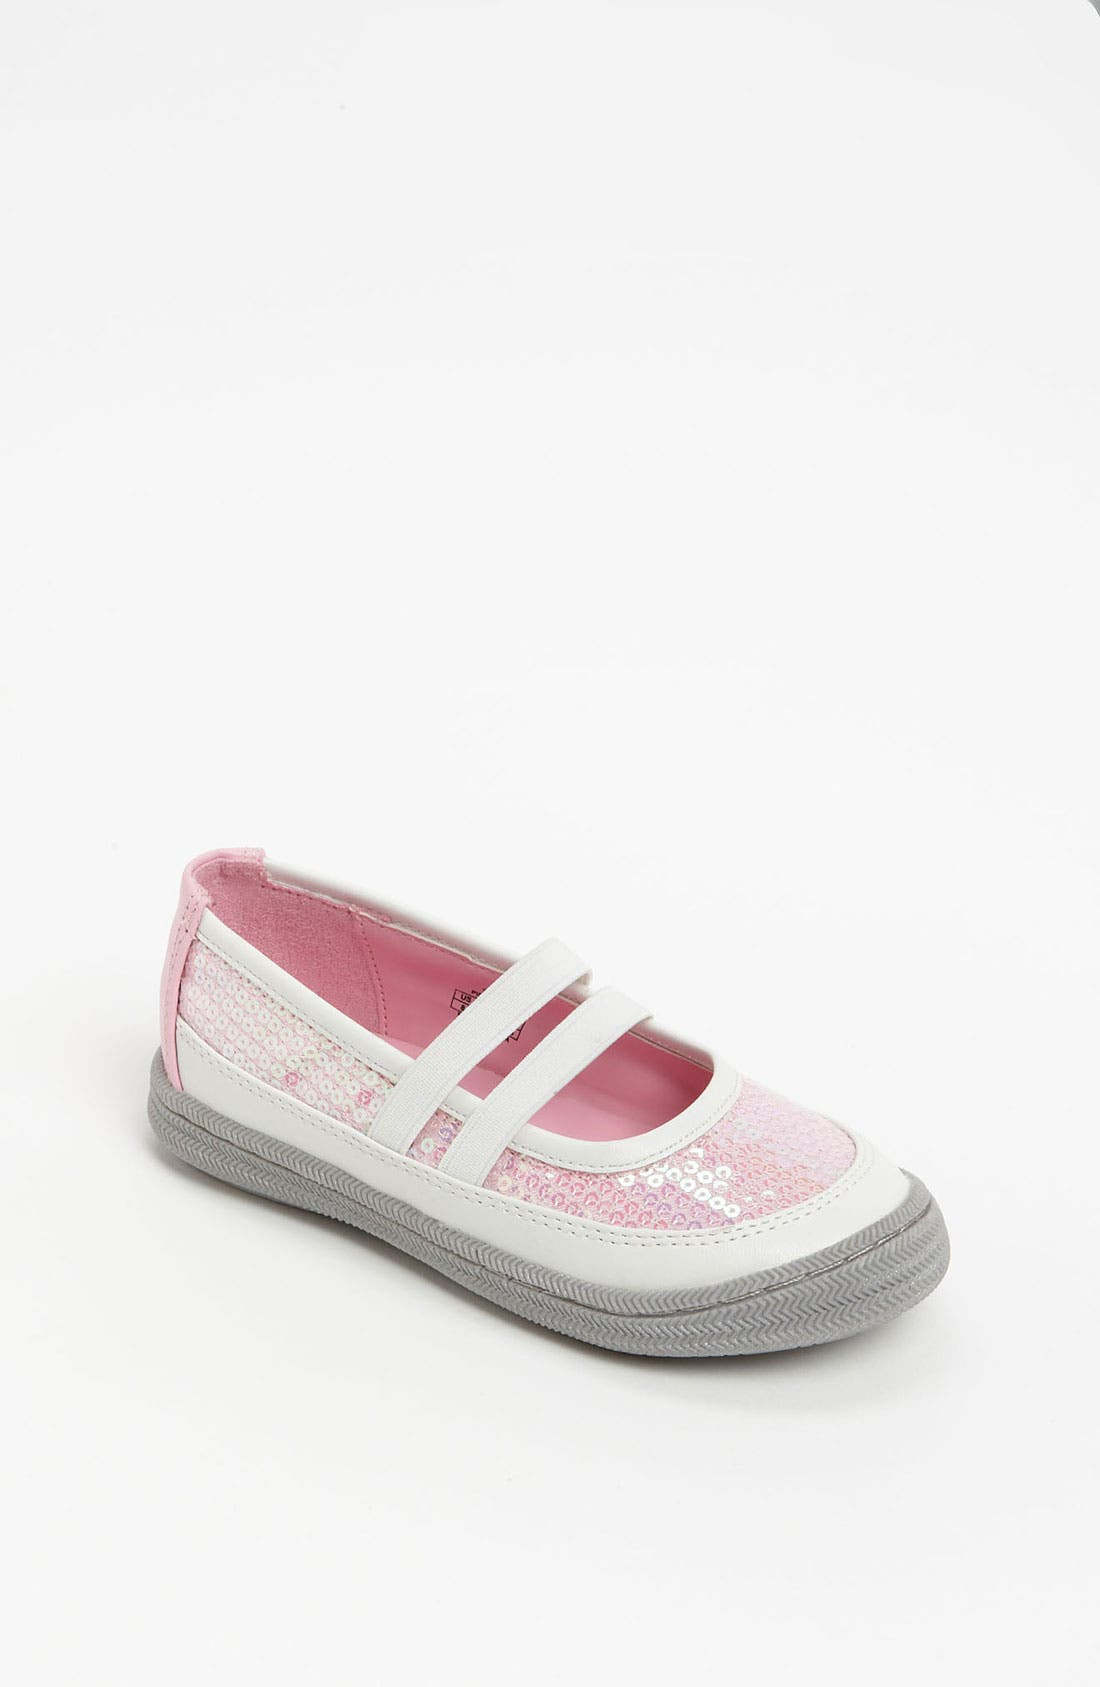 Main Image - Enzo 'Celia' Mary Jane Sneaker (Toddler)